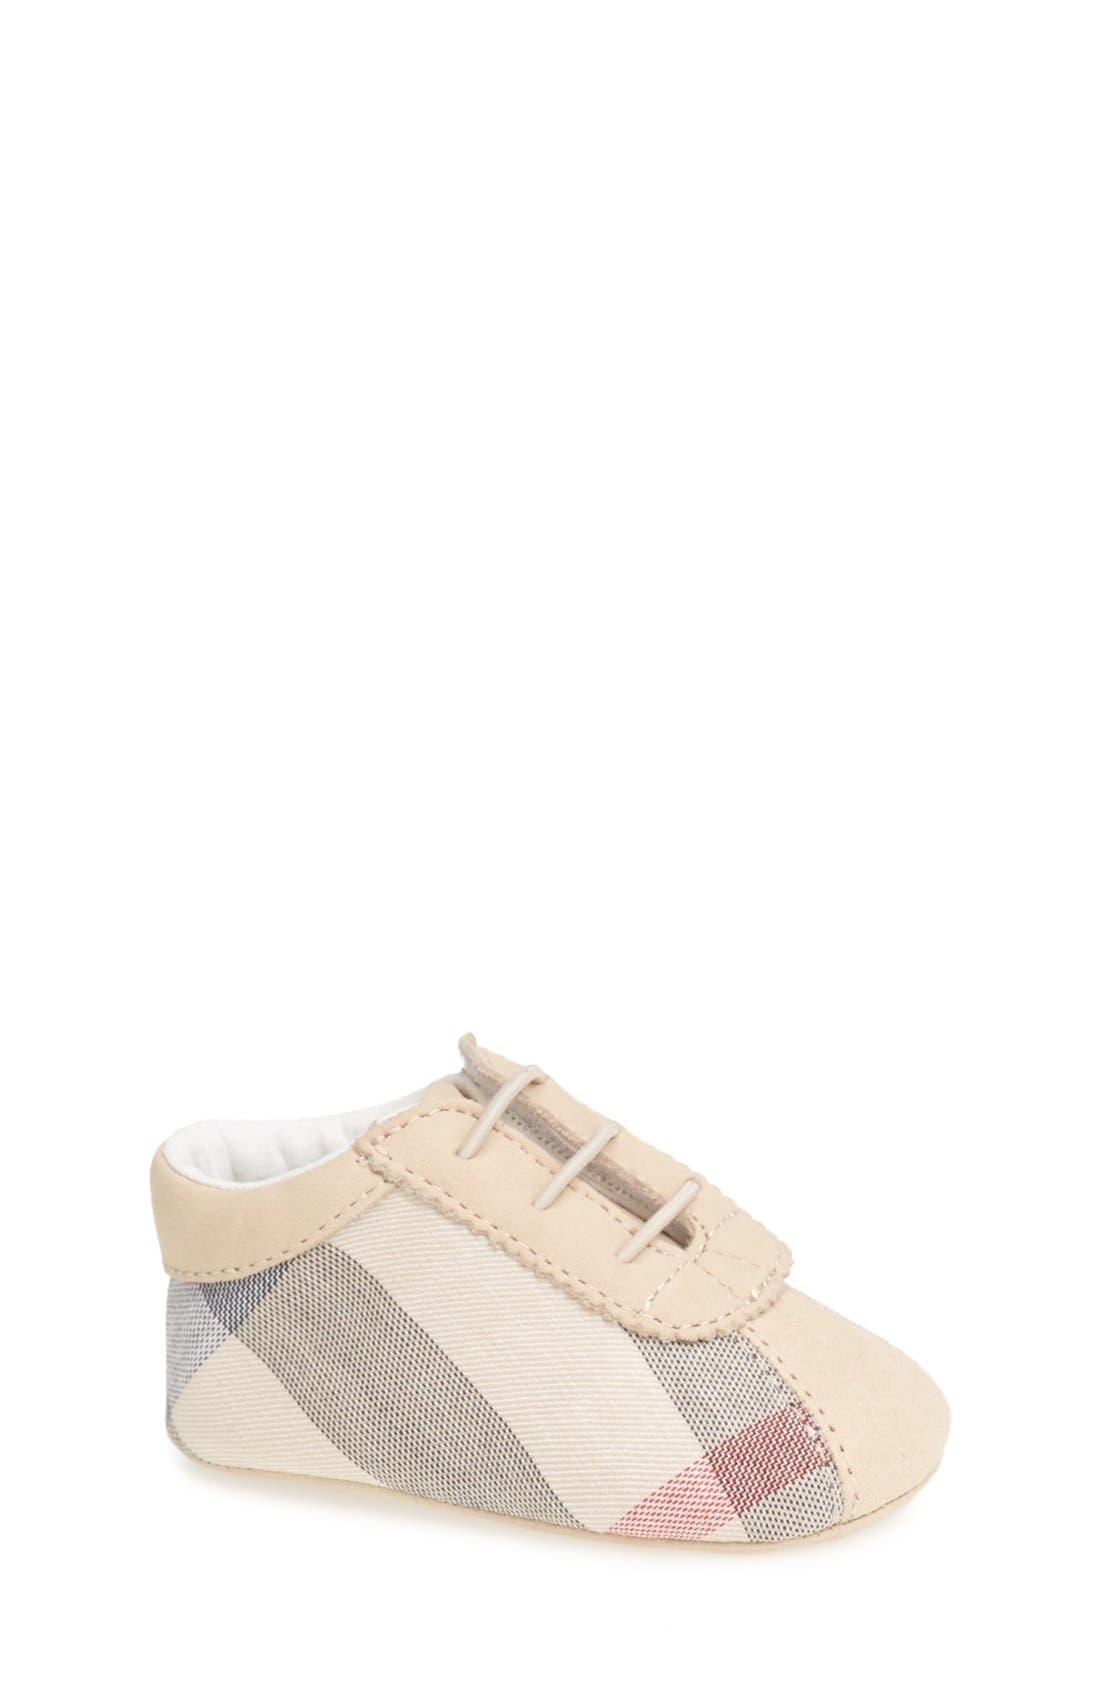 'Bosco' Crib Shoe,                             Main thumbnail 1, color,                             250